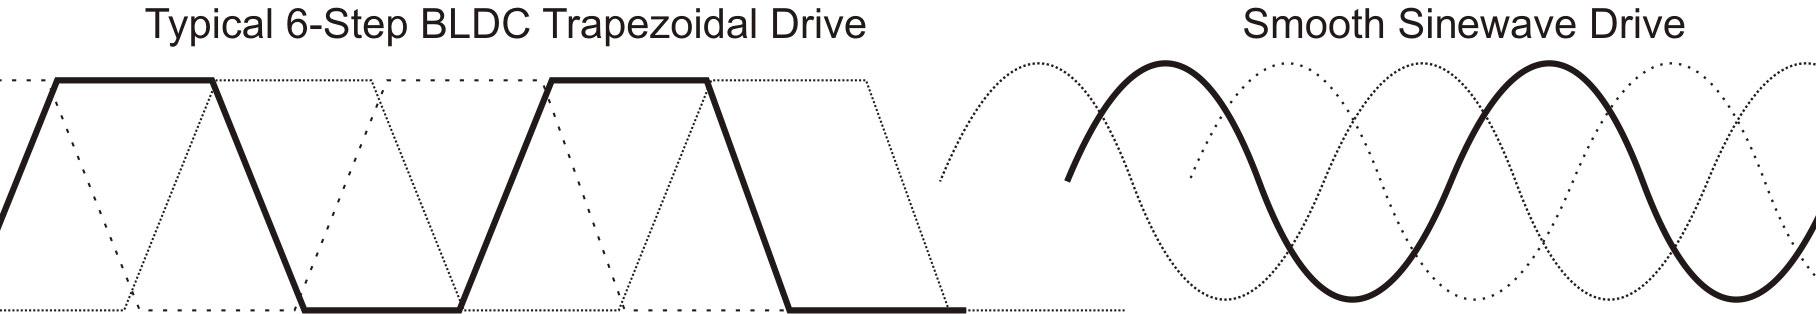 Trapezoidal vs Sinewave